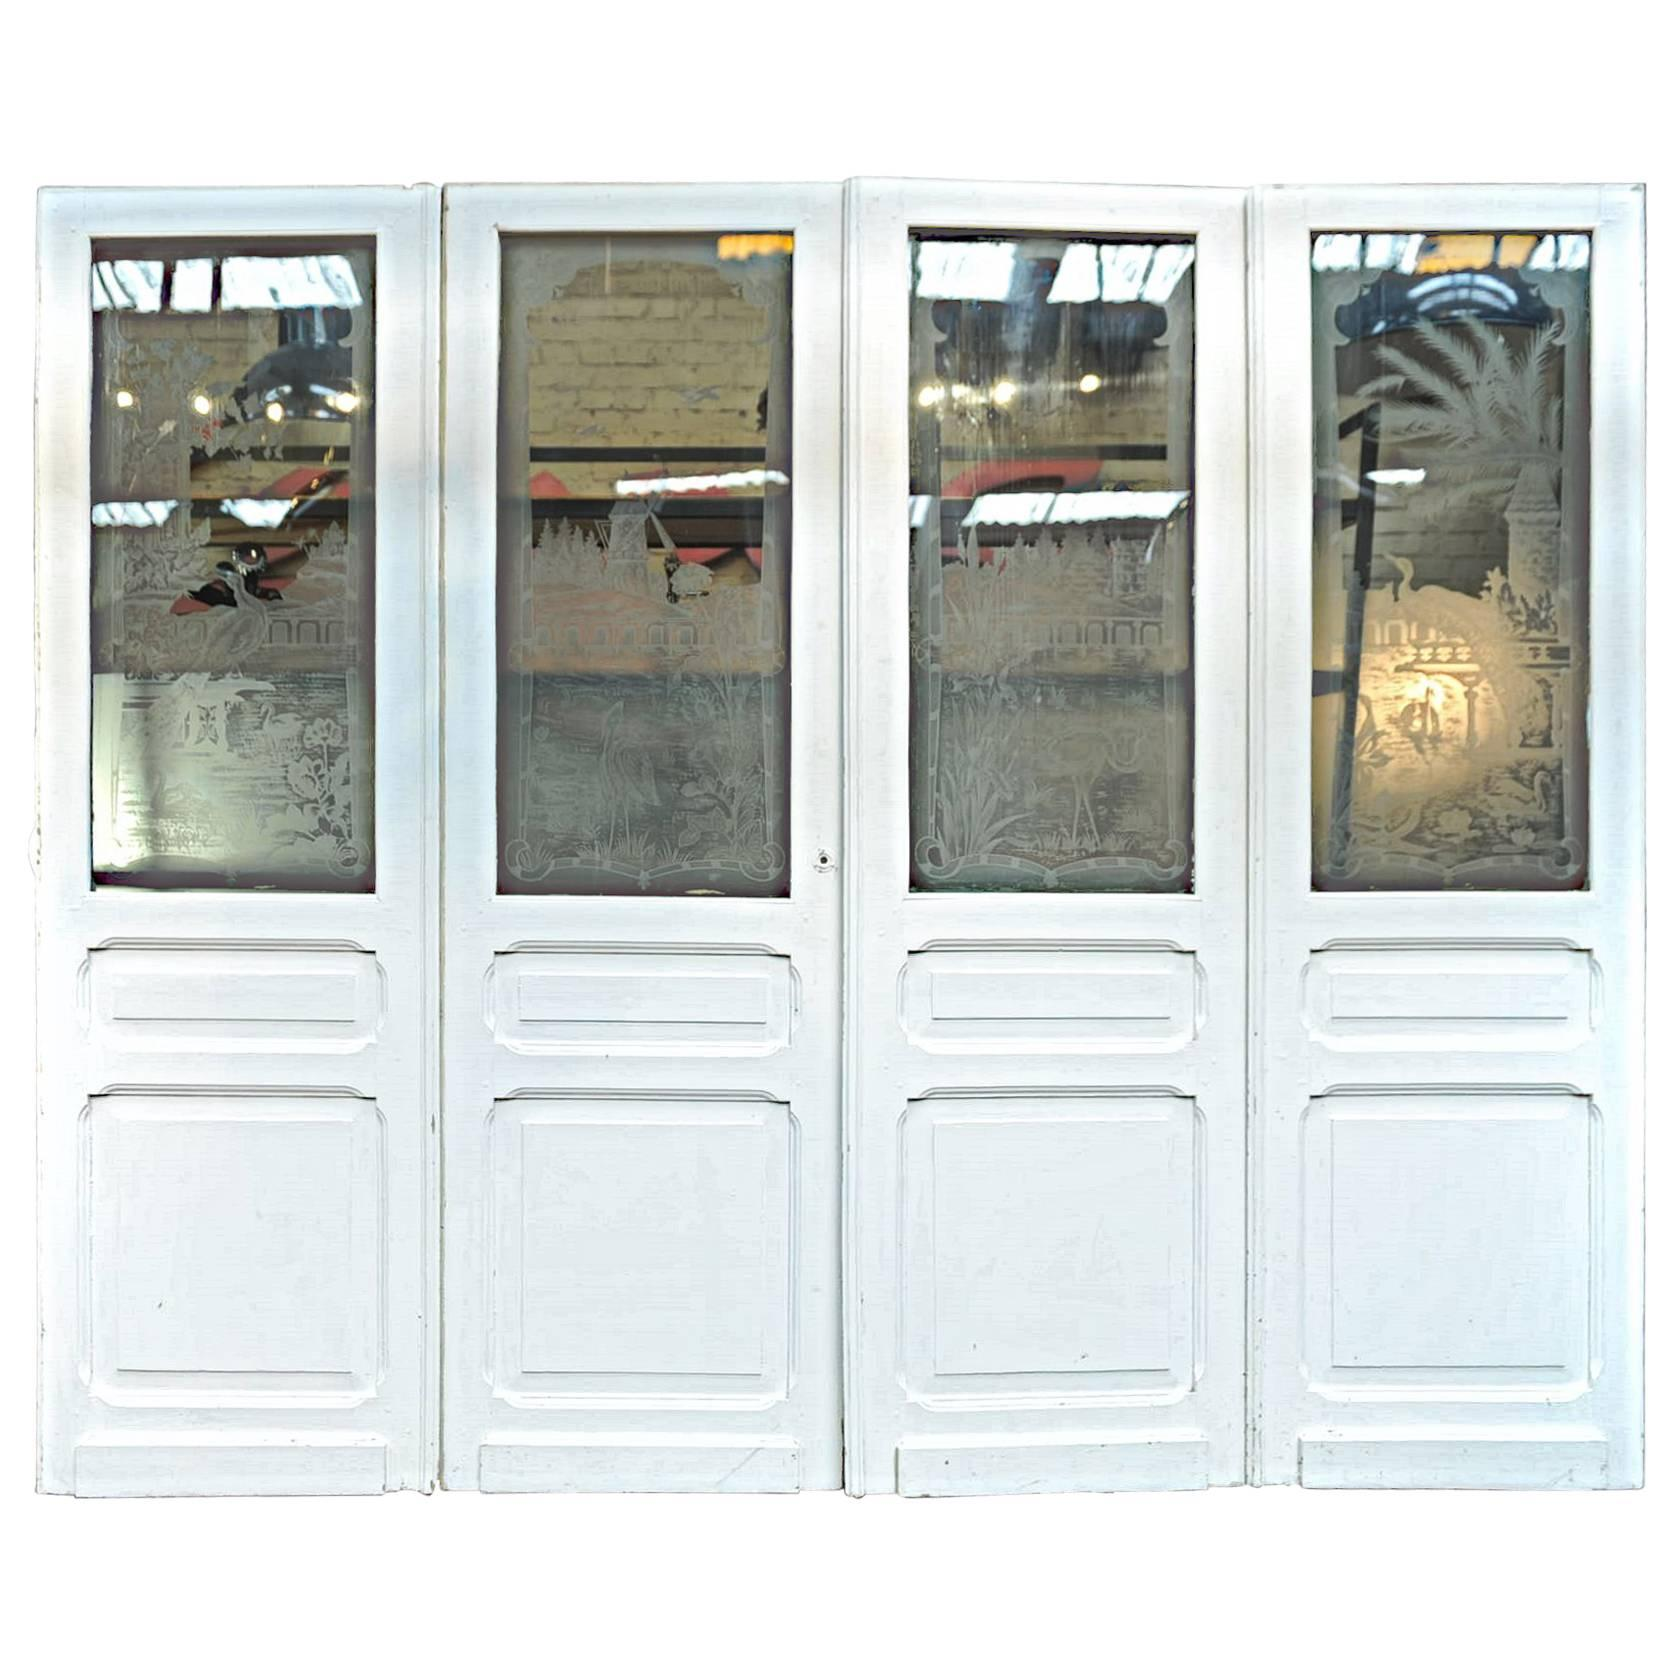 Merveilleux Set Of Four French Art Nouveau Craved Glass Inside Doors, Circa 1900 For  Sale